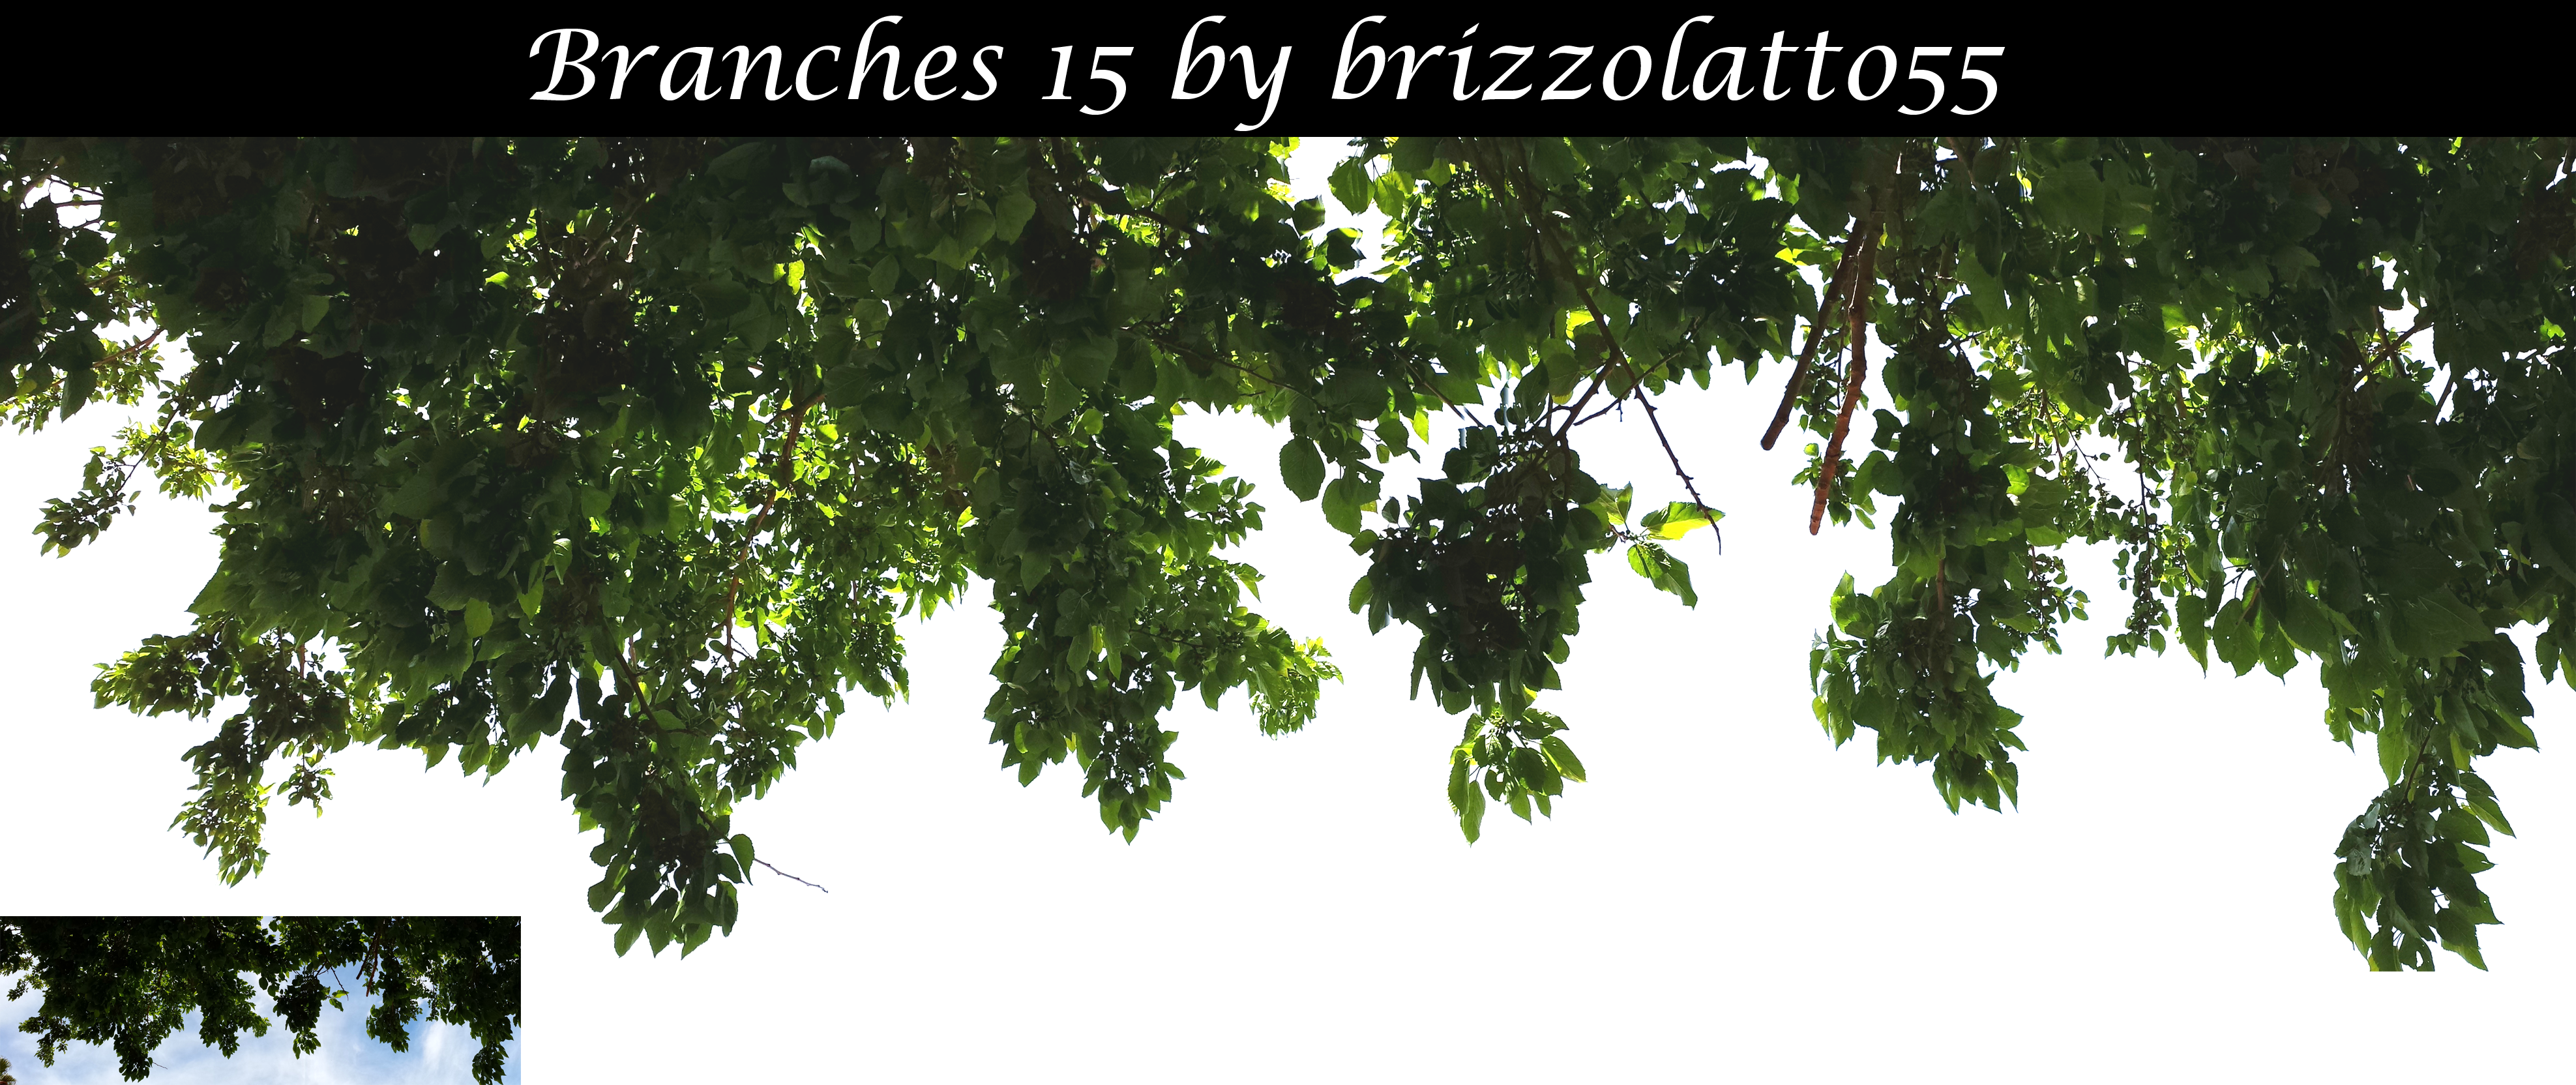 Branches 15 by Brizzolatto55